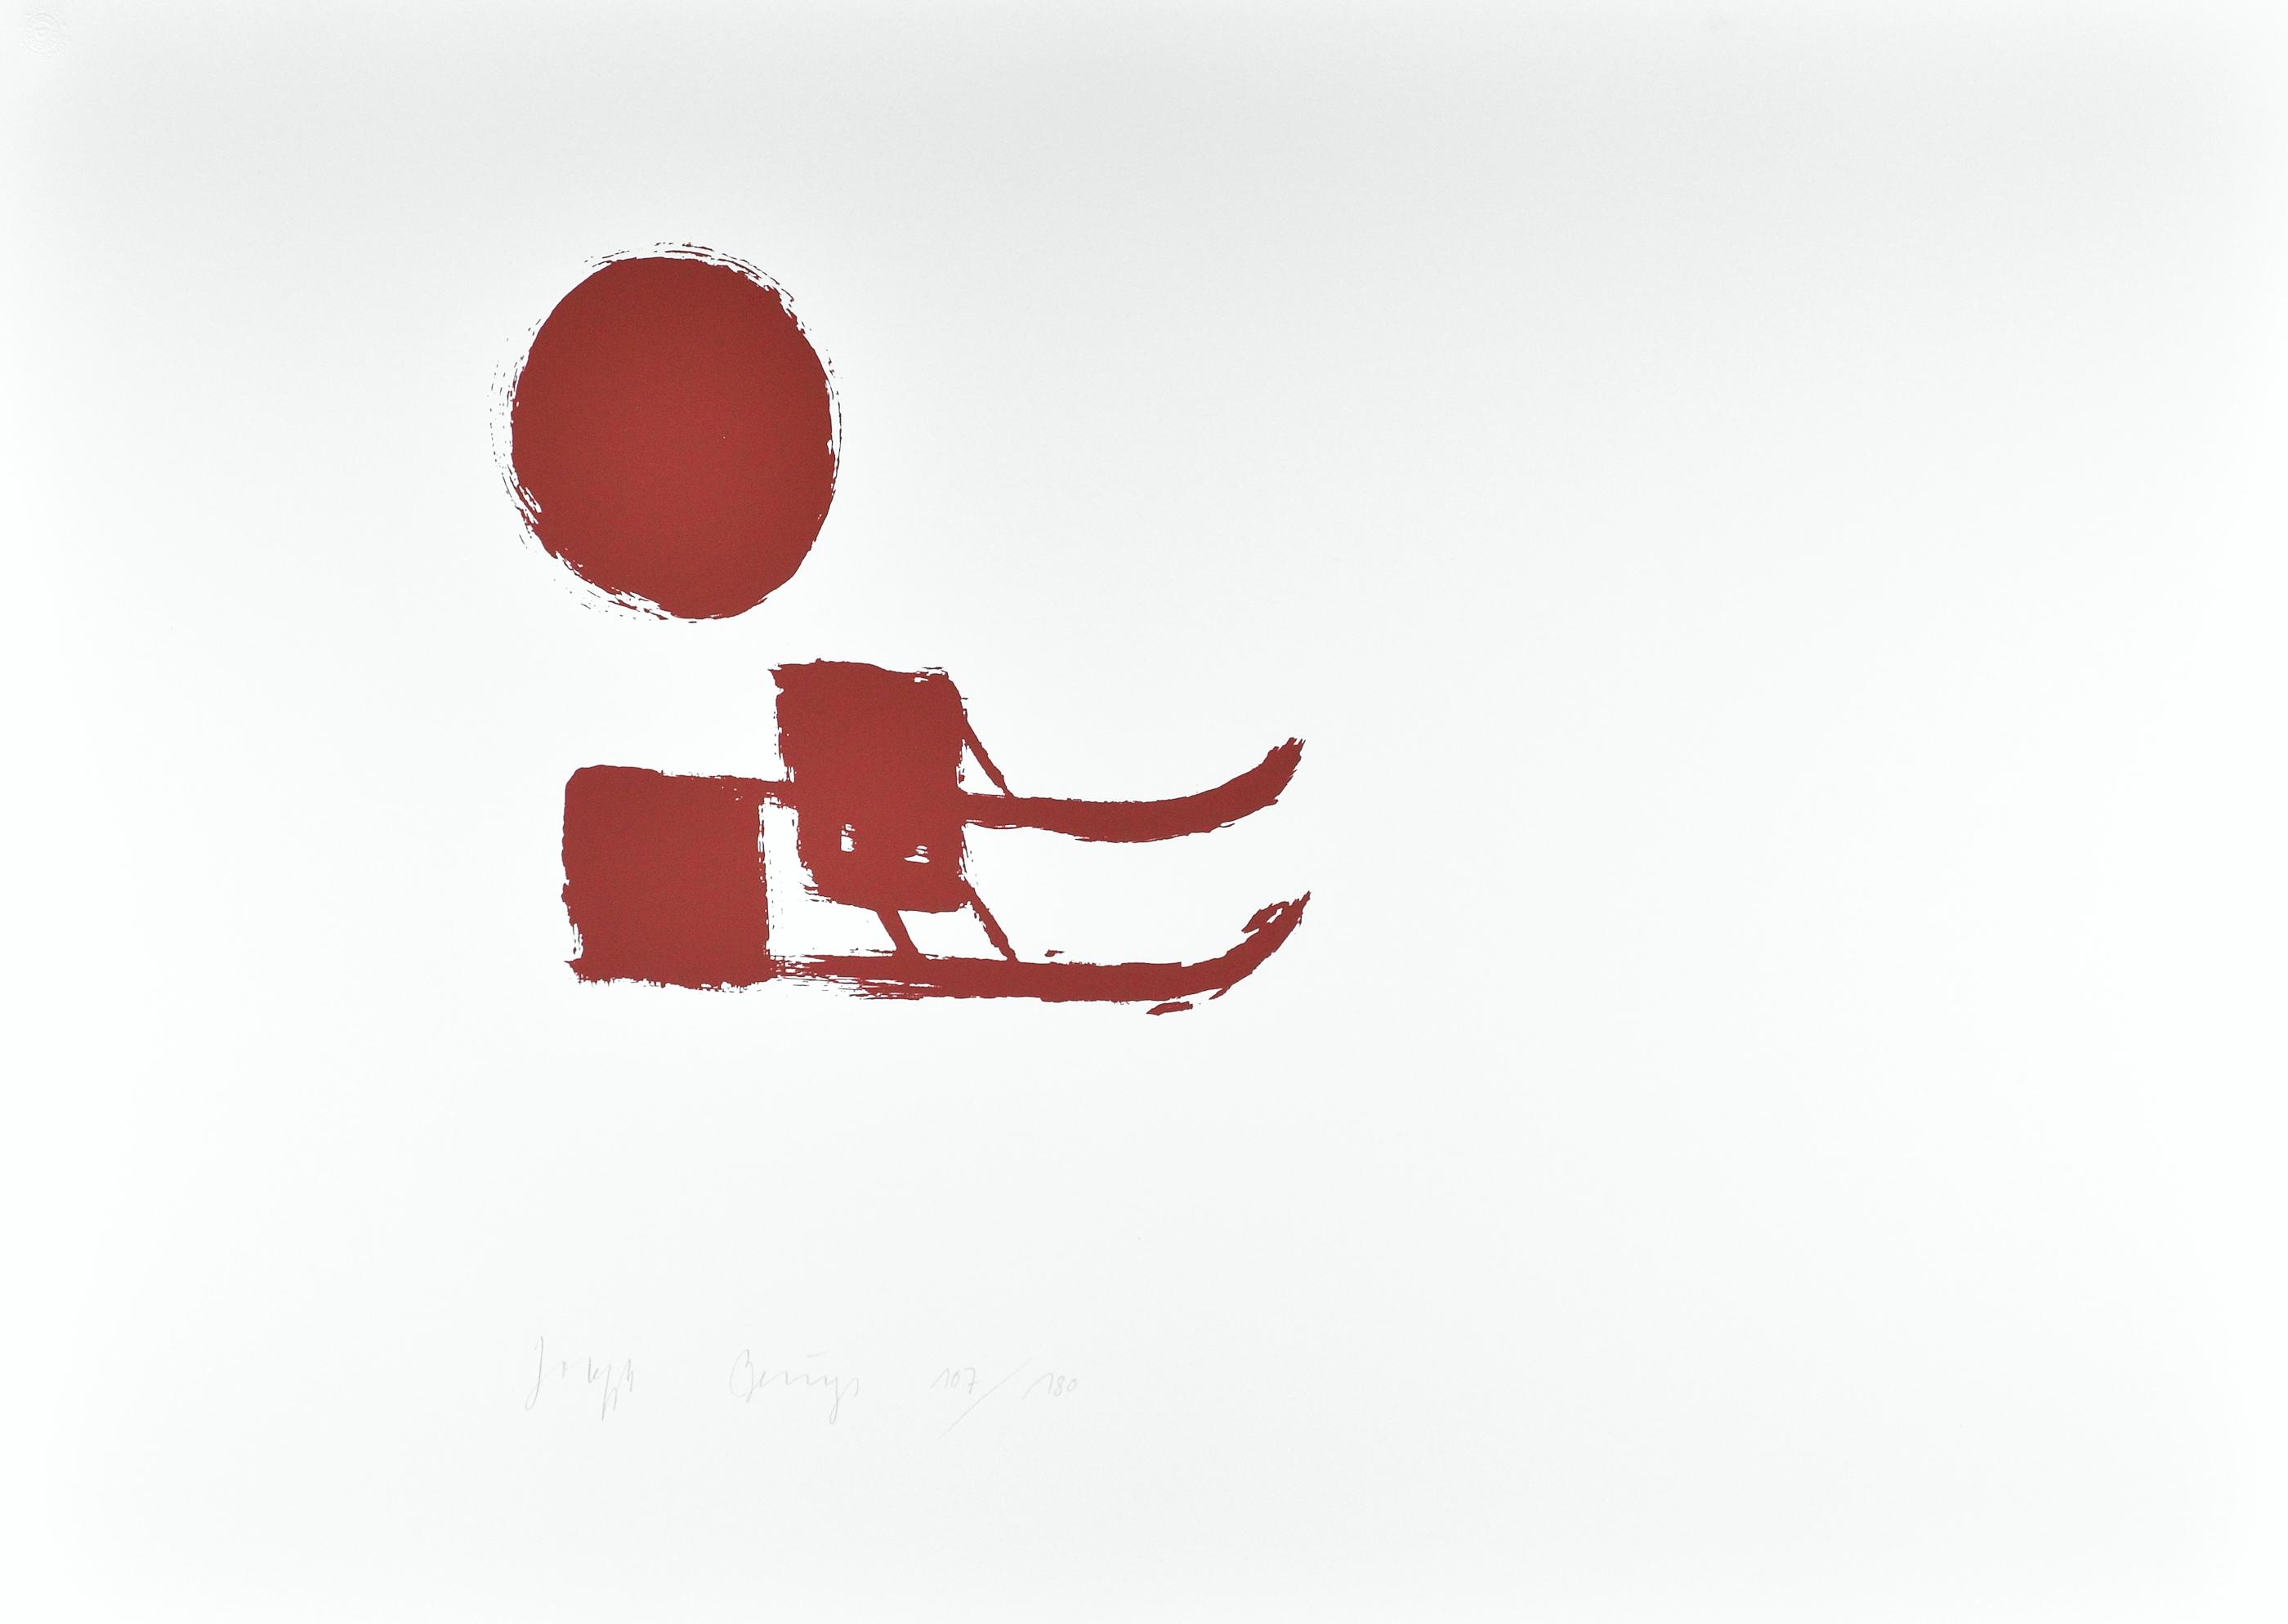 joseph beuys grafik sonnenschlitten kaufen i artedio. Black Bedroom Furniture Sets. Home Design Ideas